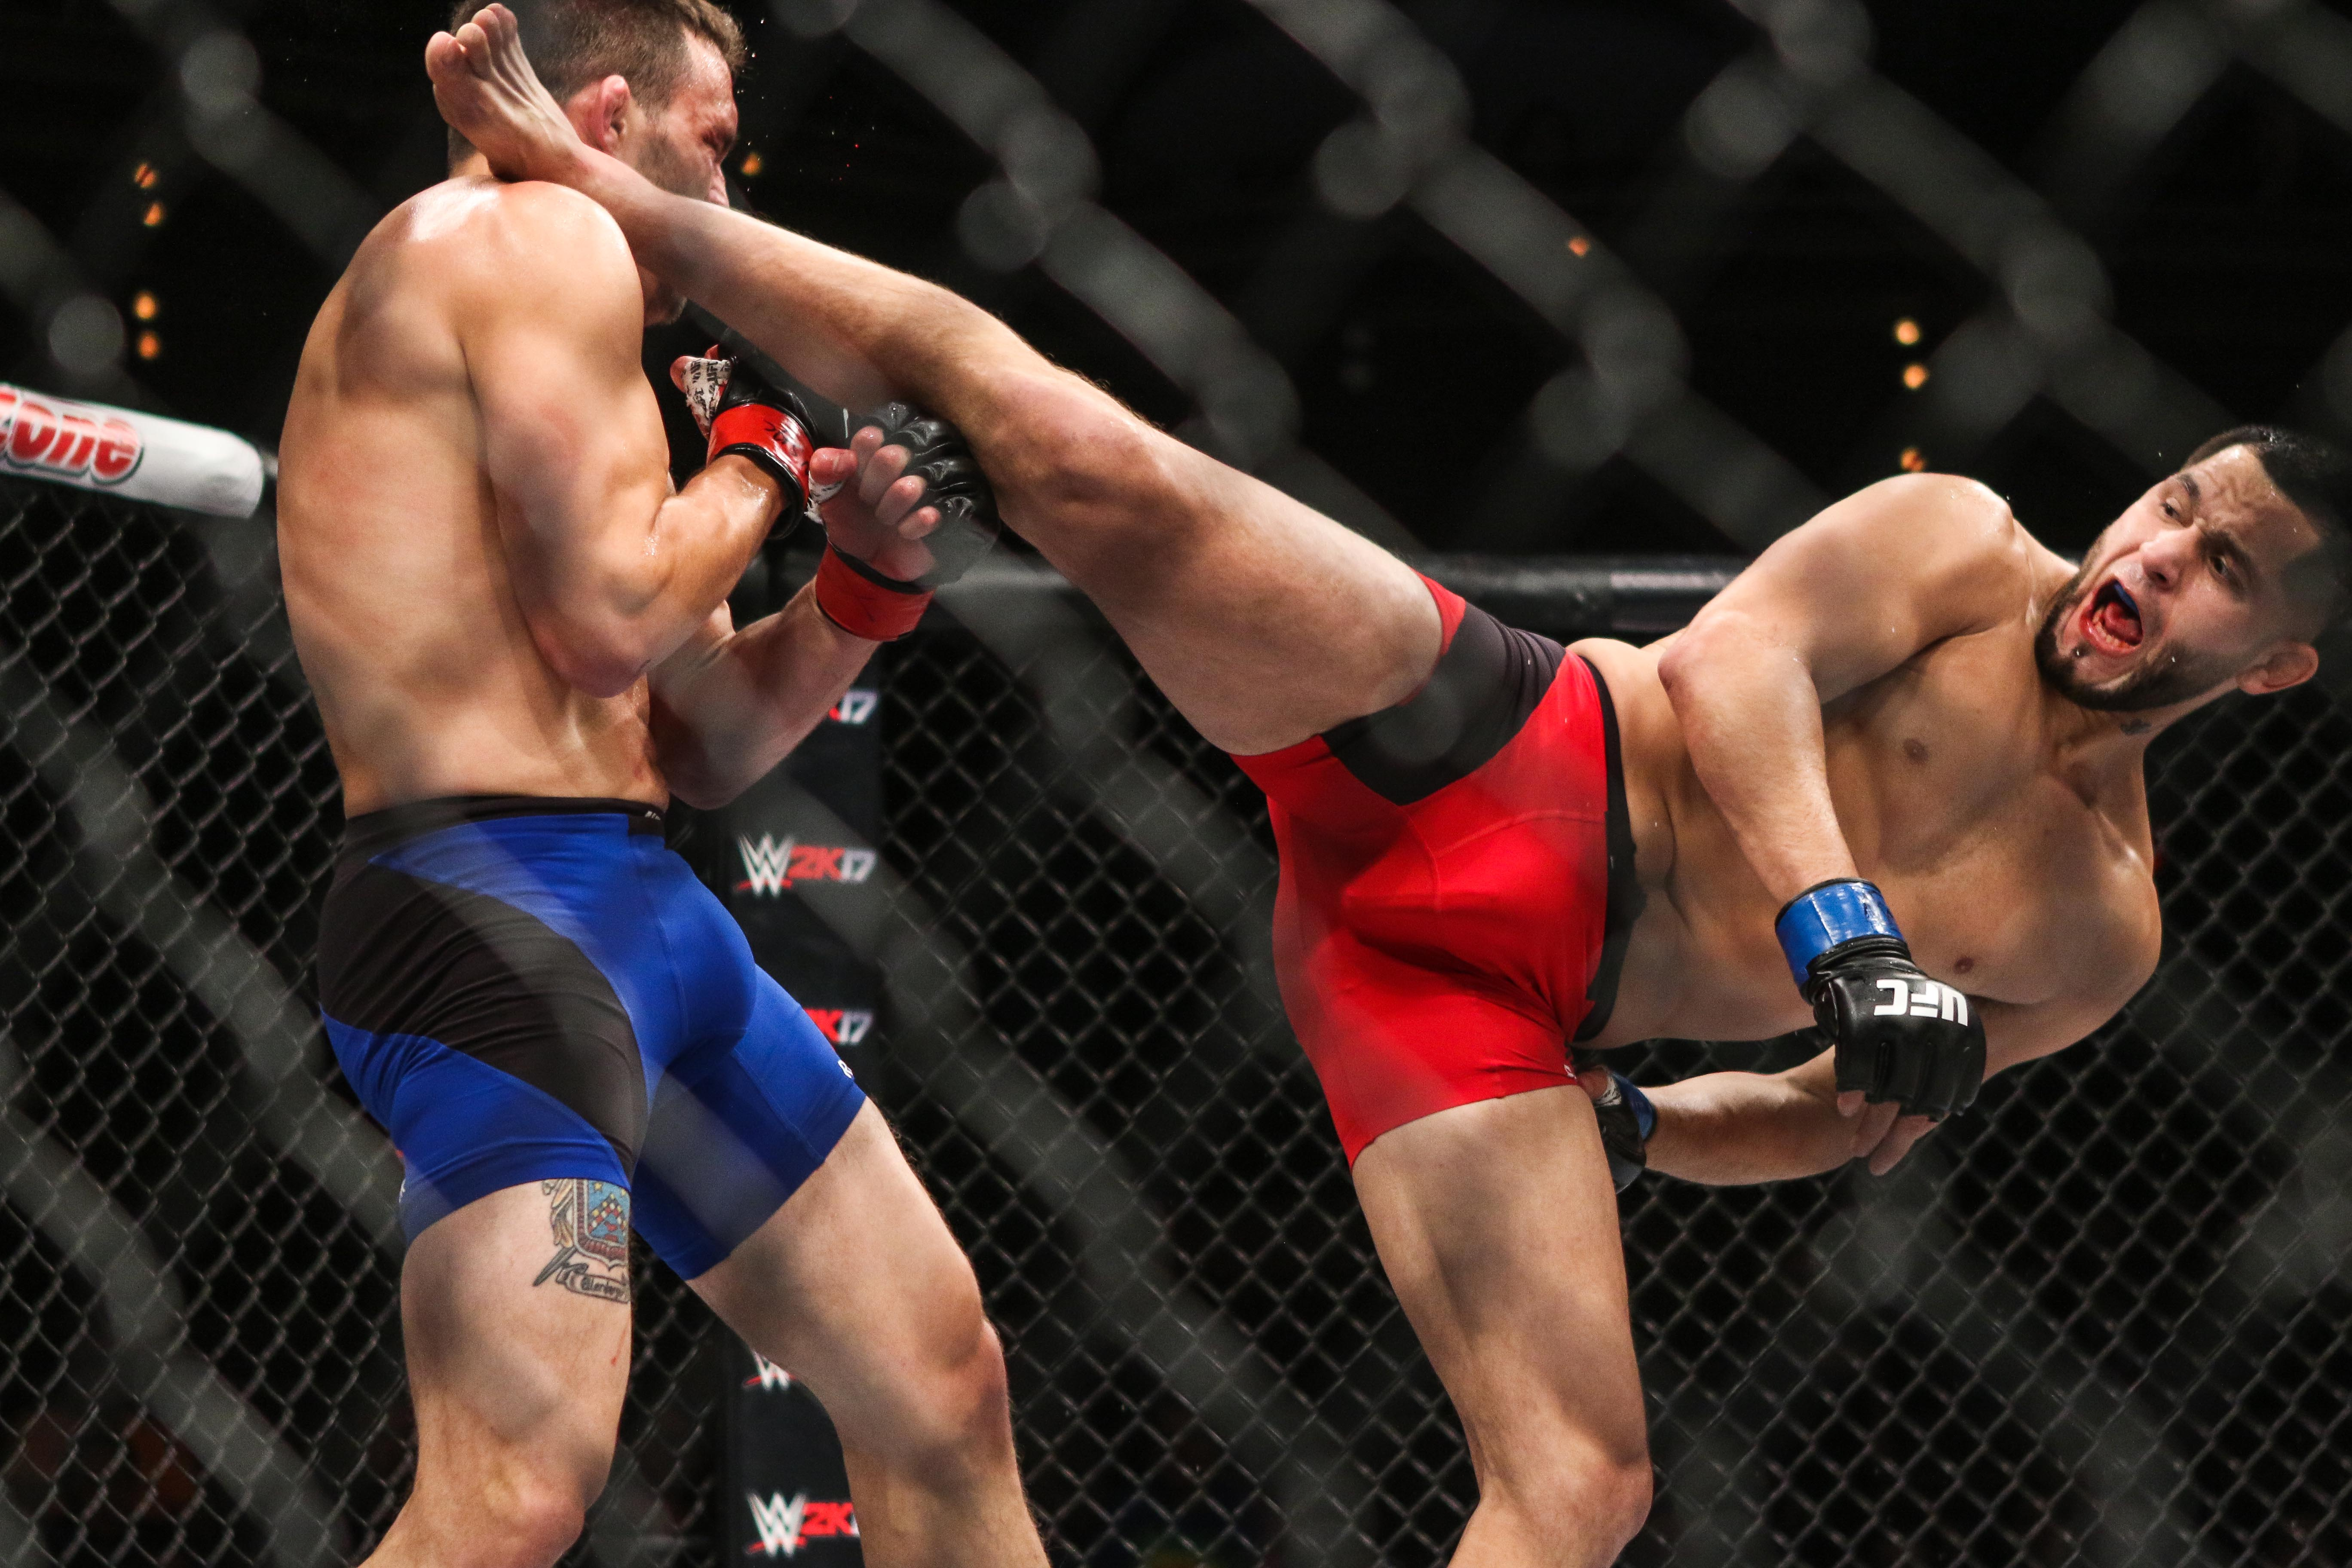 MMA: TUF Tournament of Champions-Ellenberger vs Masvidal